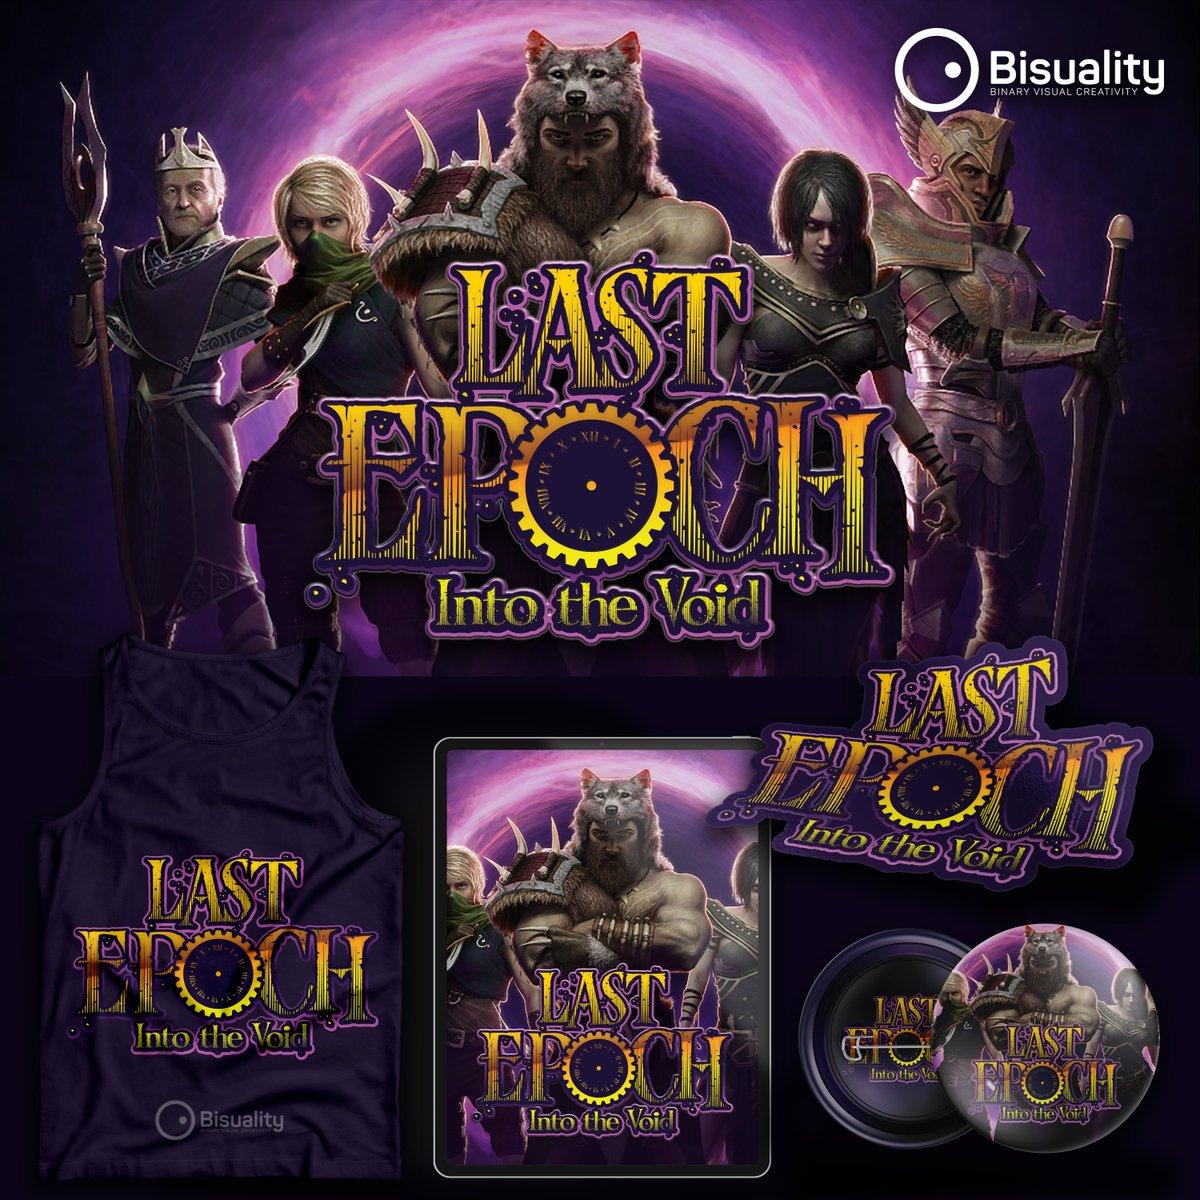 Last Epoch - Into the Void #lastepochintothevoid #gaming #gamingcommunity #steam #fantasygame #fantasygames #rpggames #darkfantasy #videogames #gamelovers #fantasyart #gamestagram #roleplaygame #gameart #fantasyroleplay #strategygame #gamesofinstagram #digitalworks #gaminglifepic.twitter.com/V3F6KGfnSt